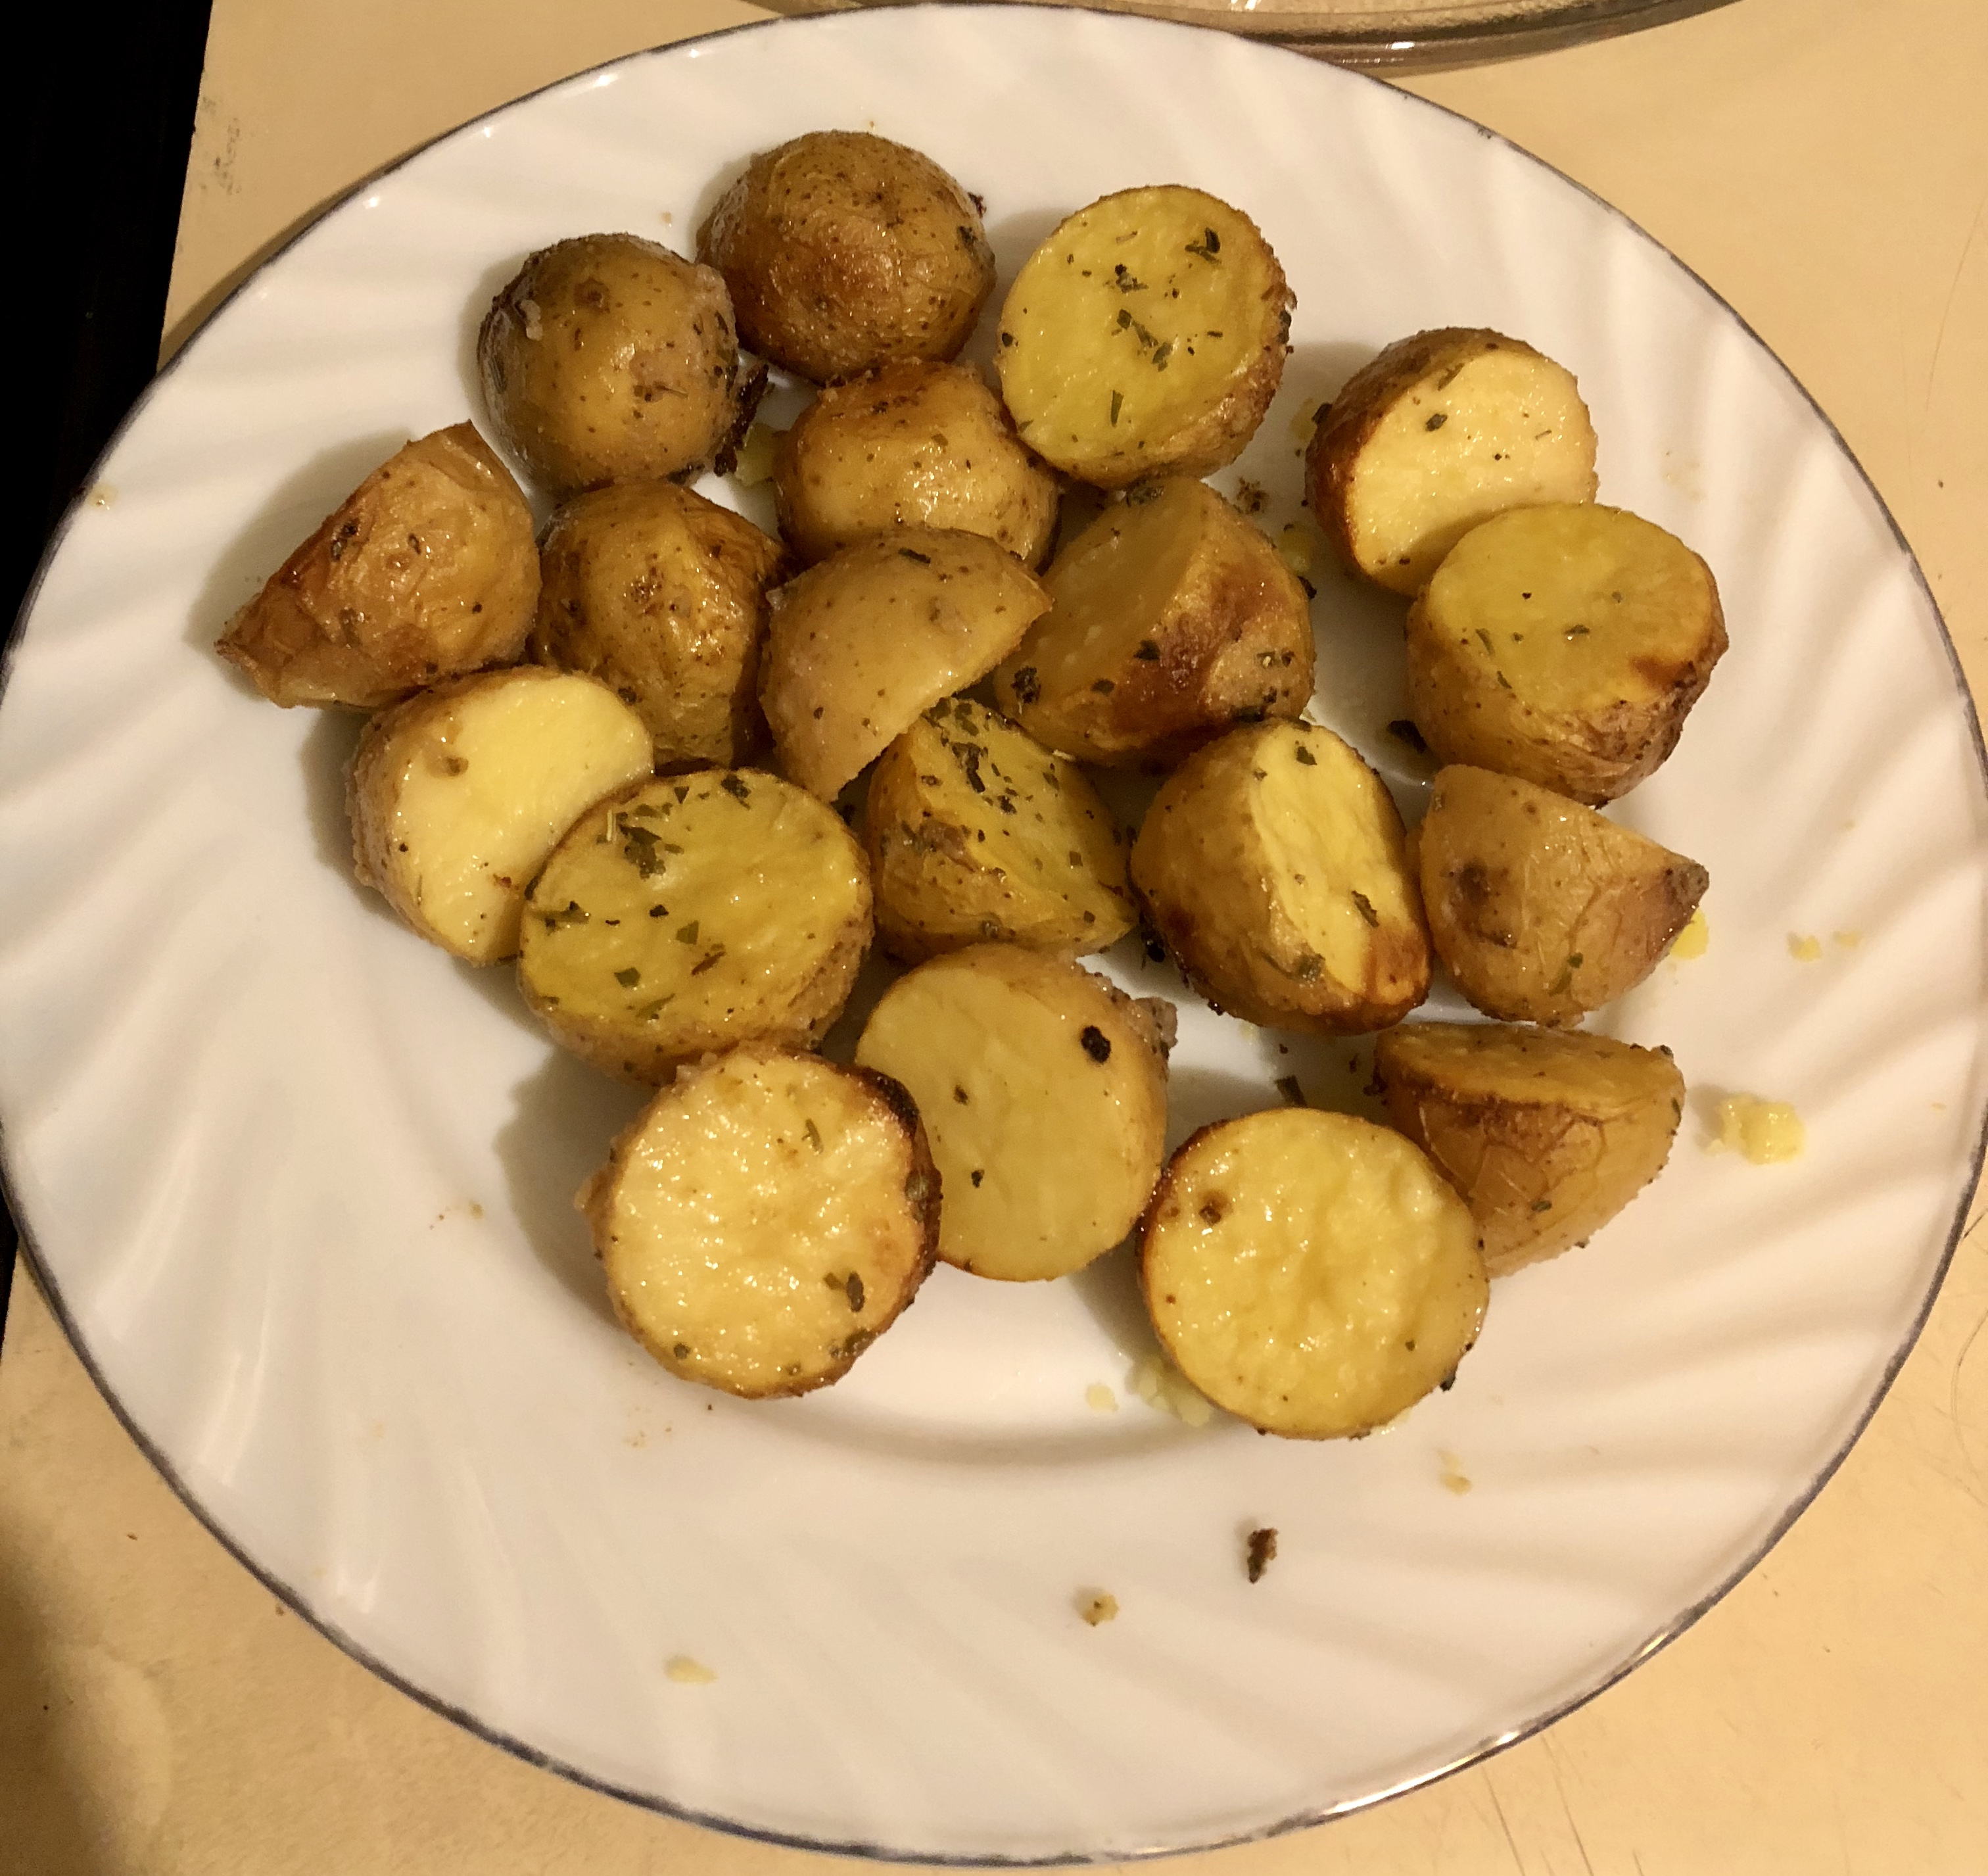 Garlic and Vinegar Roasted Potatoes